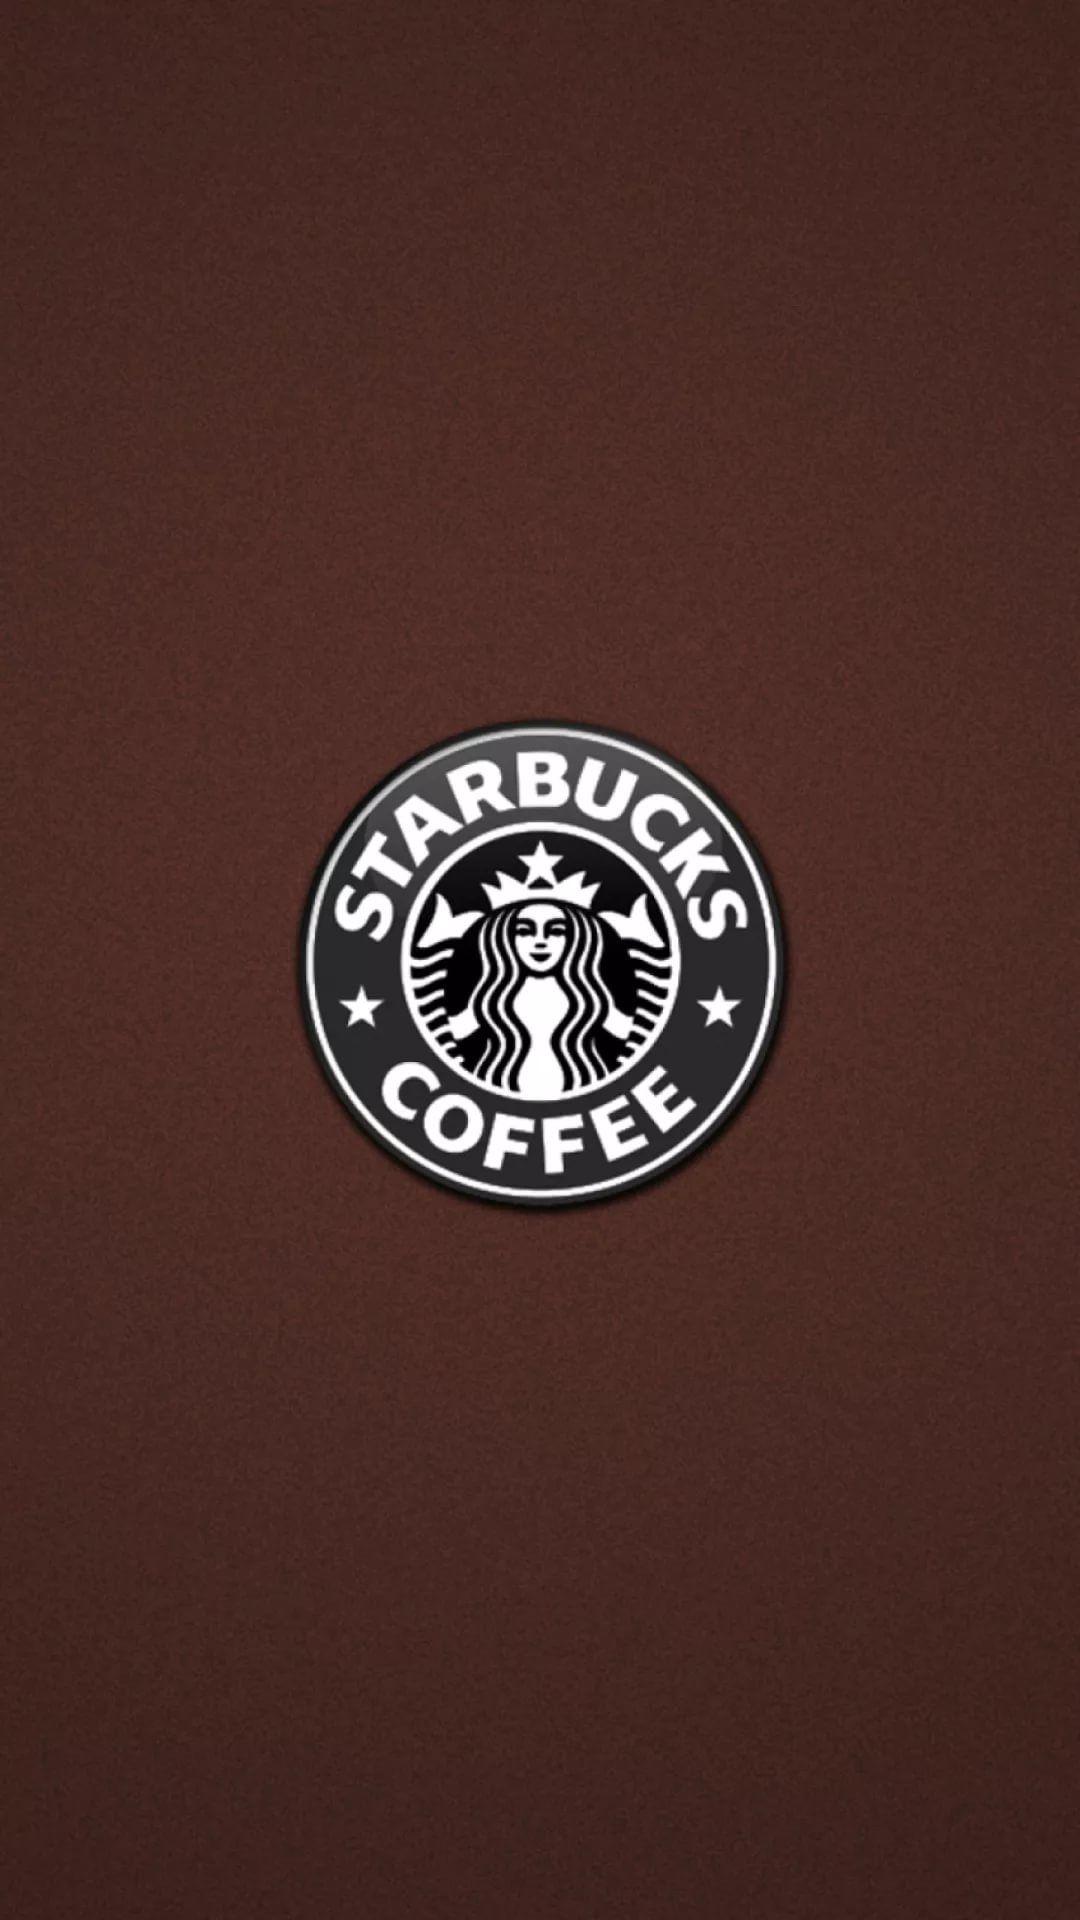 Starbucks iPhone 6 wallpaper tumblr